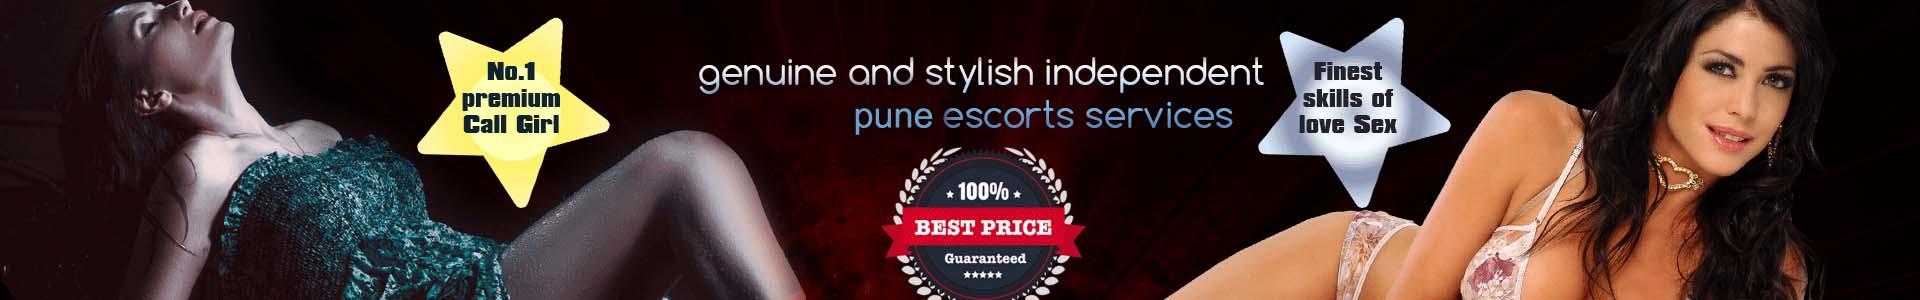 Coimbatore Escort | Plan a sensual night with enchanting Coimbatore escorts